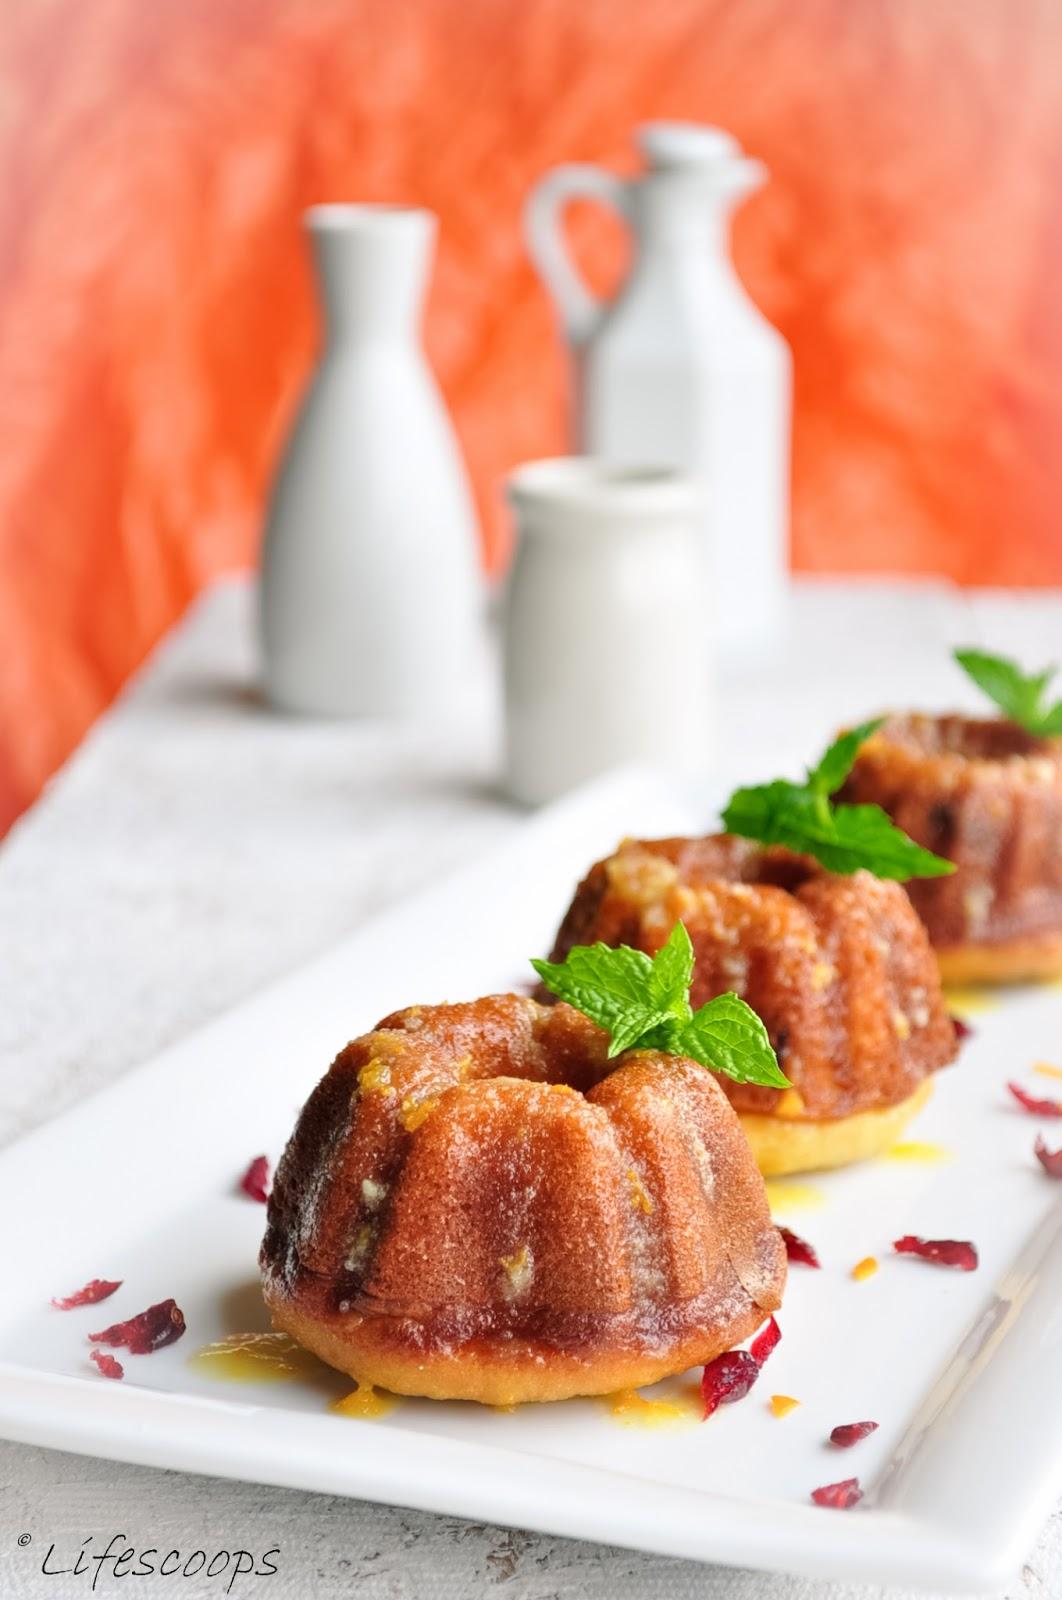 Cranberry Orange Bundt Cake Recipe